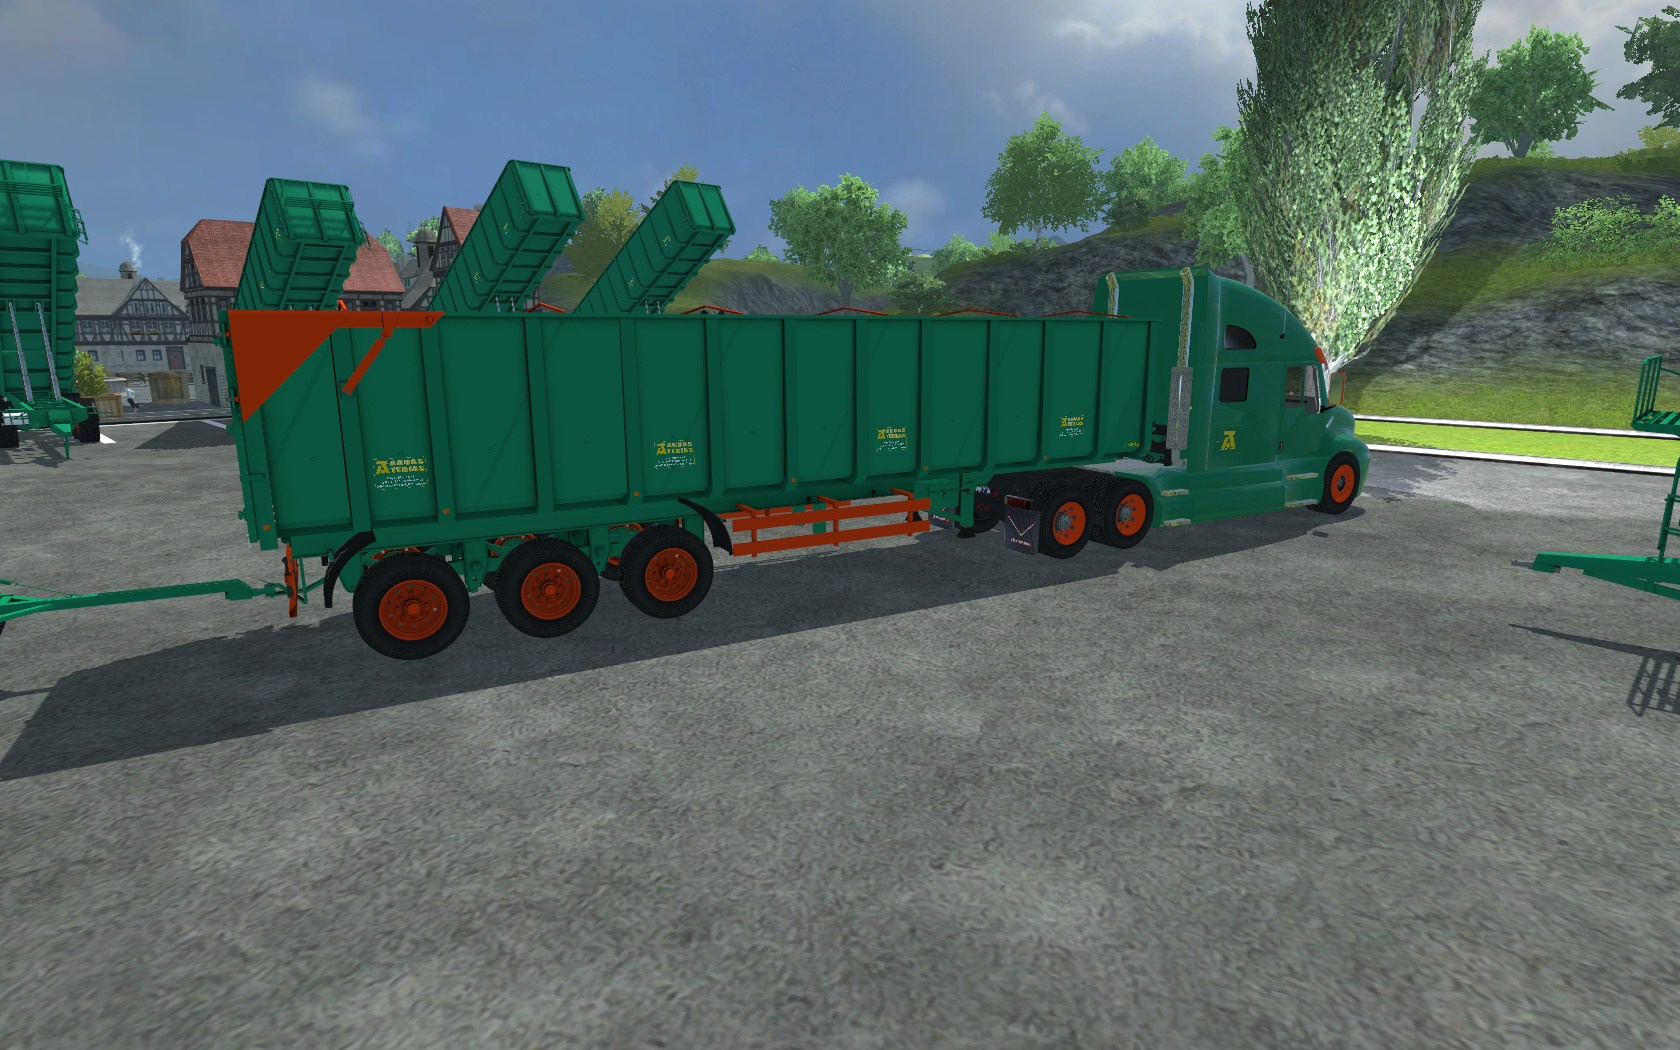 [Encuesta][T.E.P.] Proyecto Aguas Tenias (22 modelos + 1 Camión) [Terminado 21-4-2014]. - Página 4 Fsscreen_2014_01_05_0g6sw1